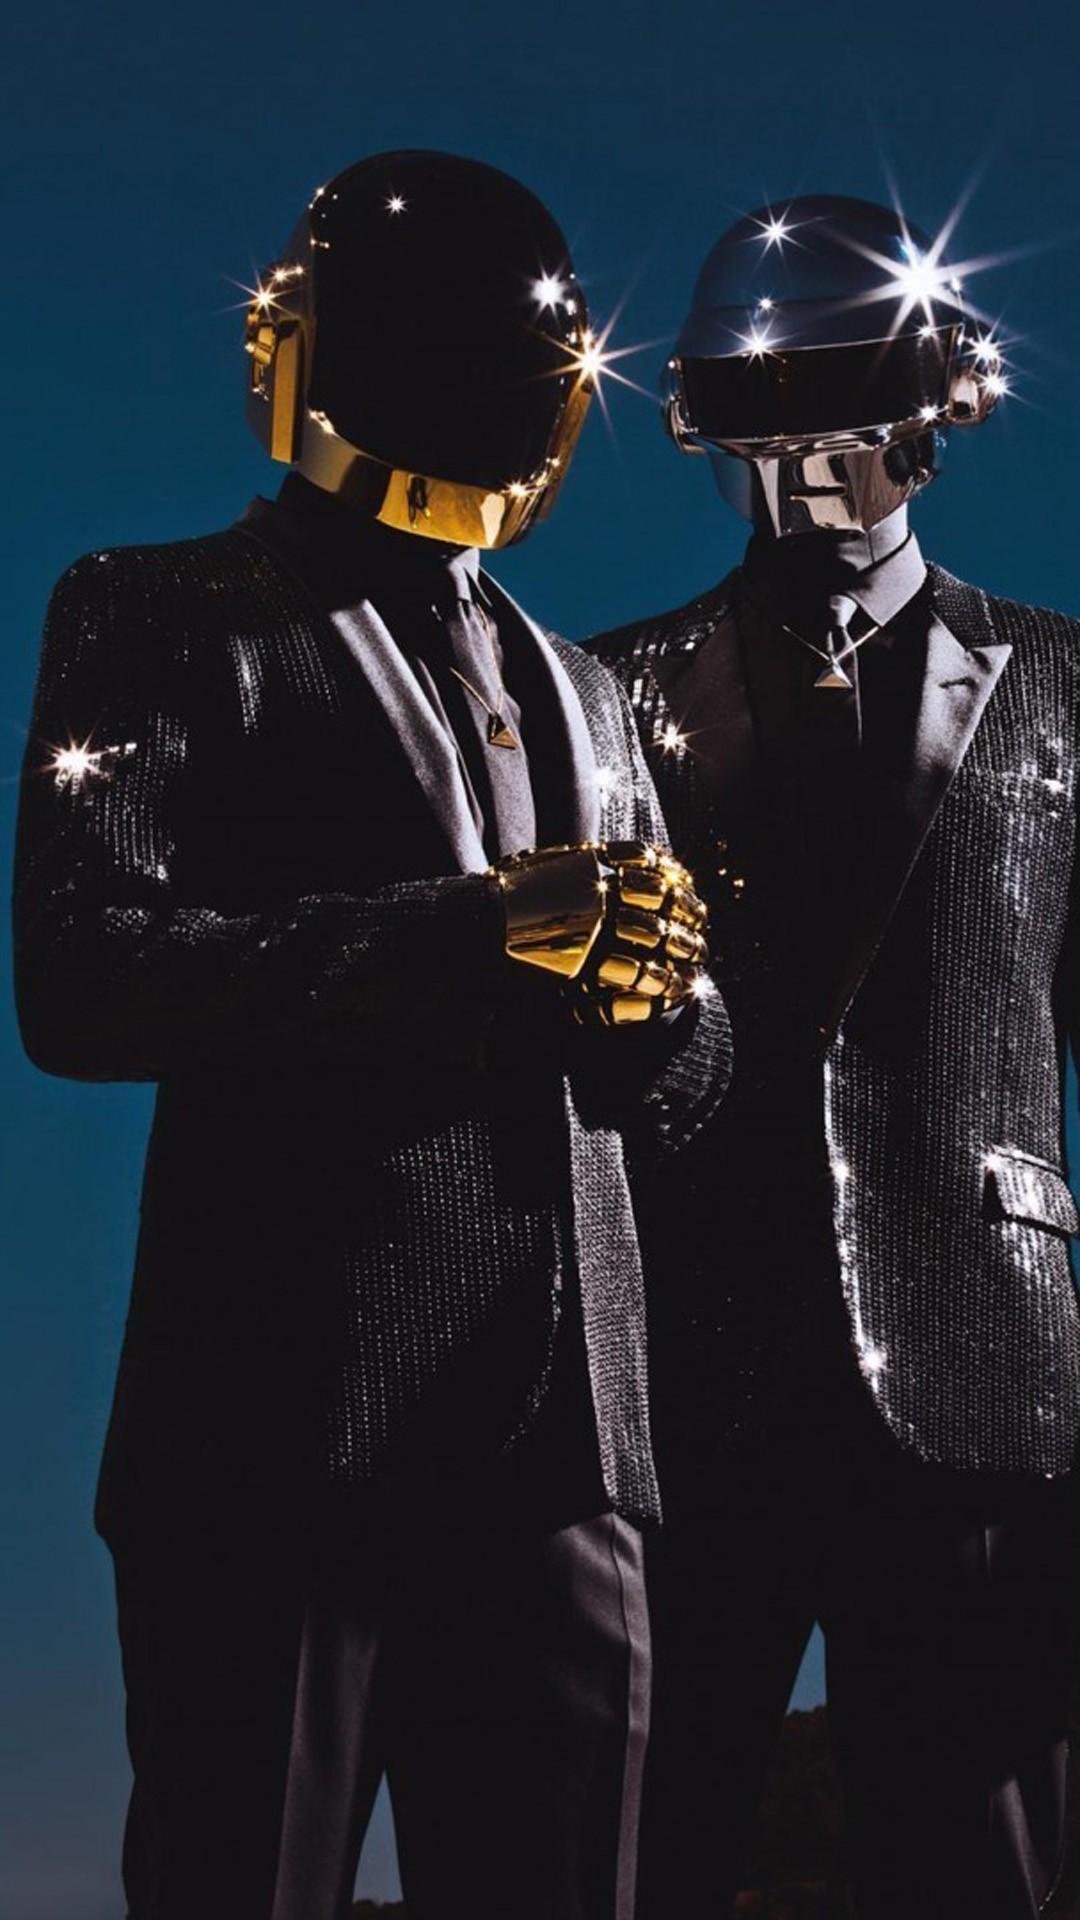 Daft Punk Iphone Wallpaper Daft Punk IPhone Wallpaper HD ...